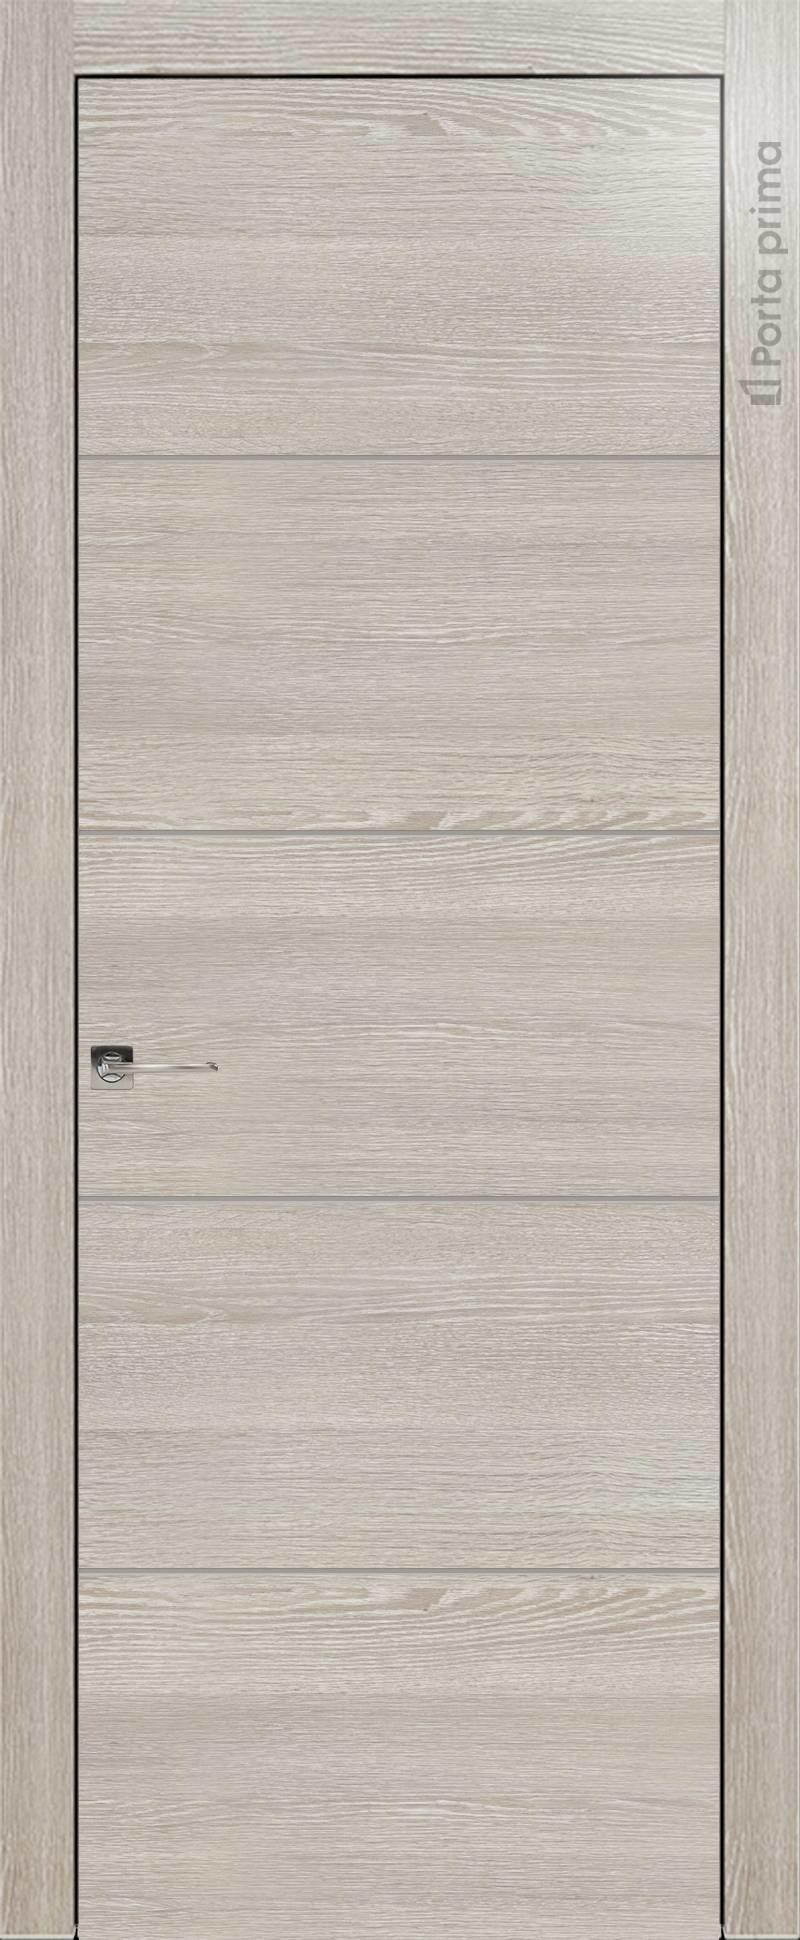 Tivoli Д-2 цвет - Серый дуб Без стекла (ДГ)